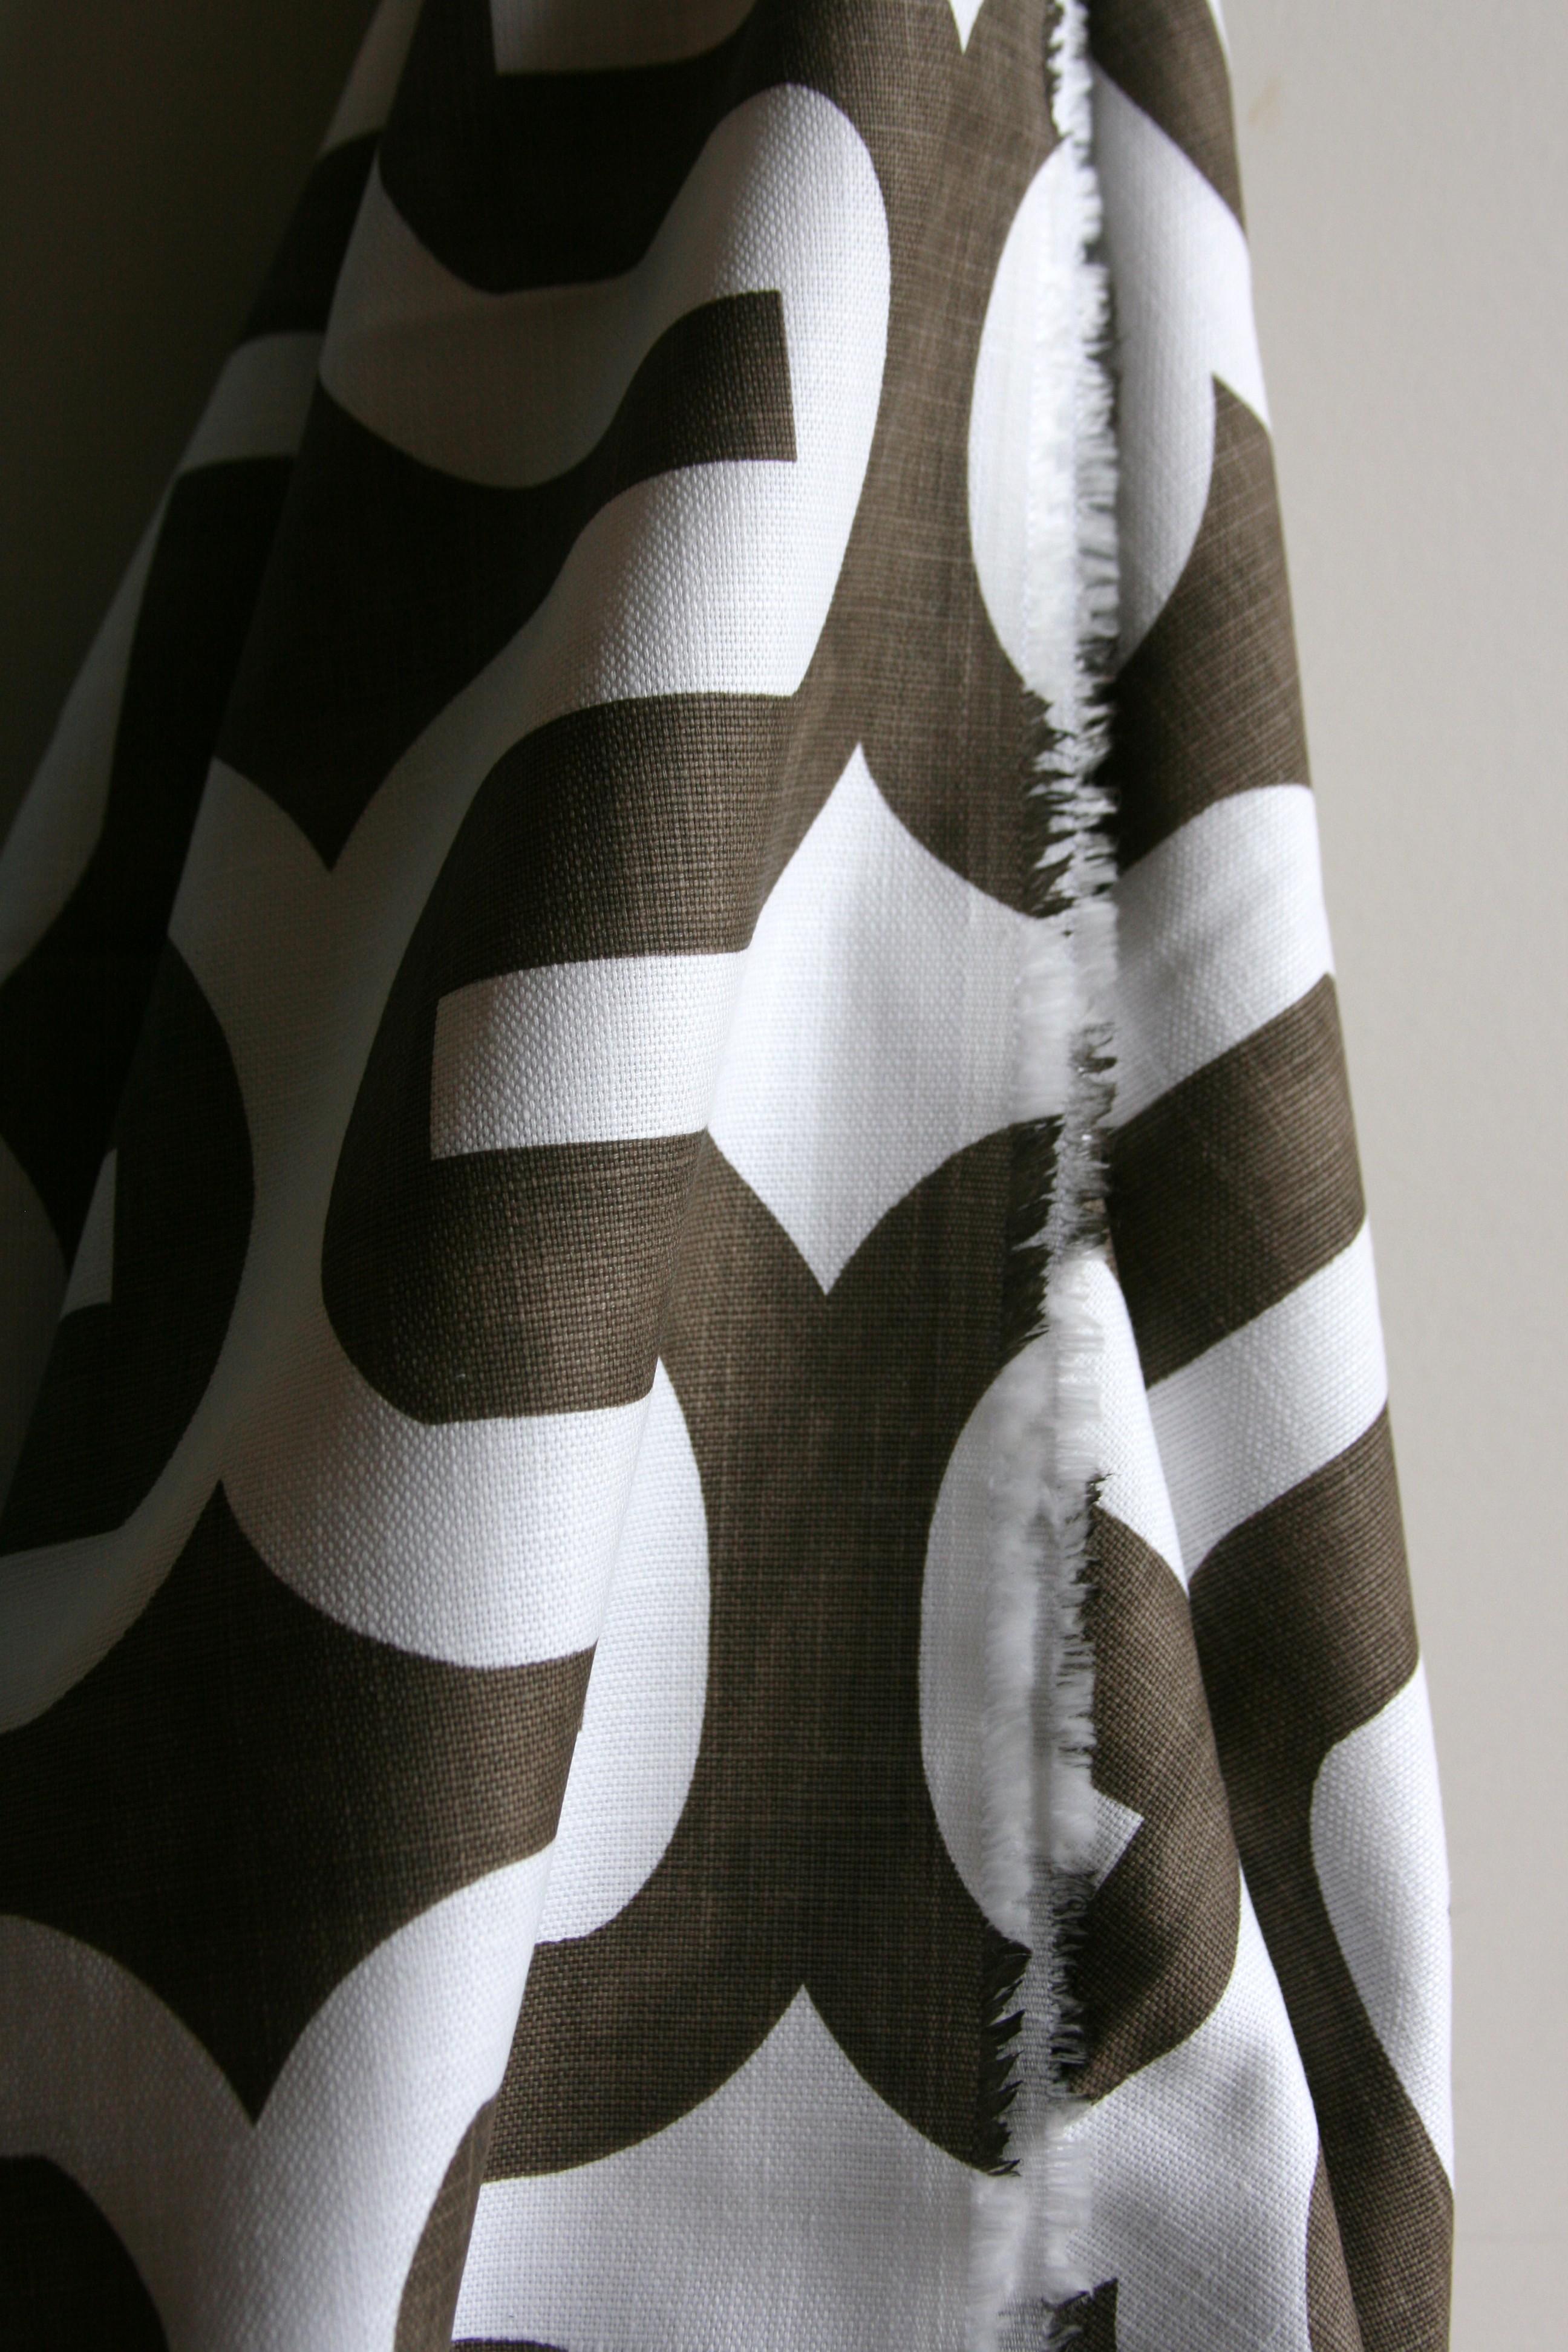 blog art of house pattern interiors jade curtain shower diy